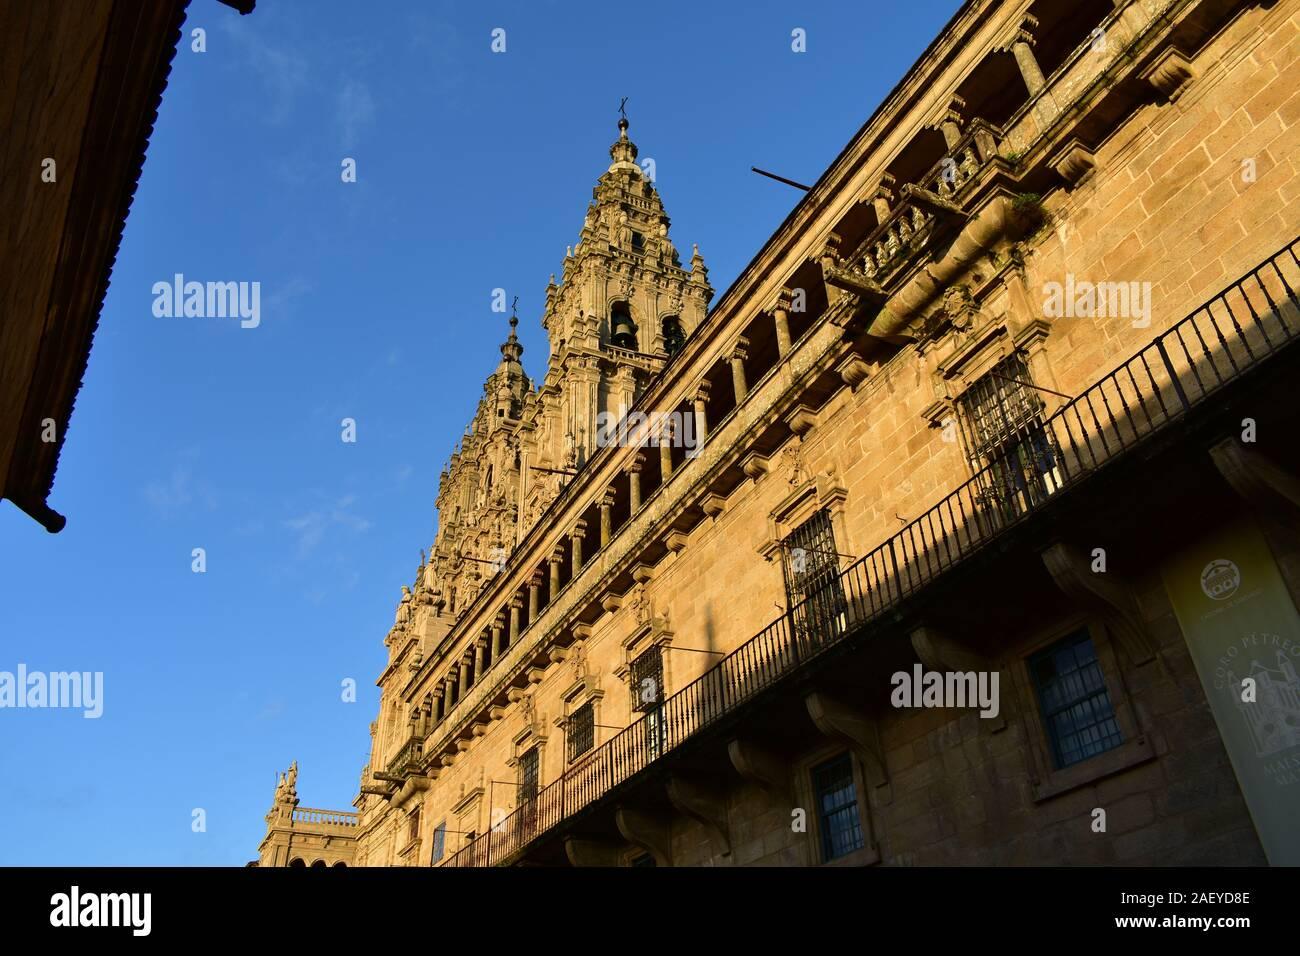 Cathedral with sunset light and blue sky. View from Praza do Obradoiro. Santiago de Compostela, Spain. Stock Photo